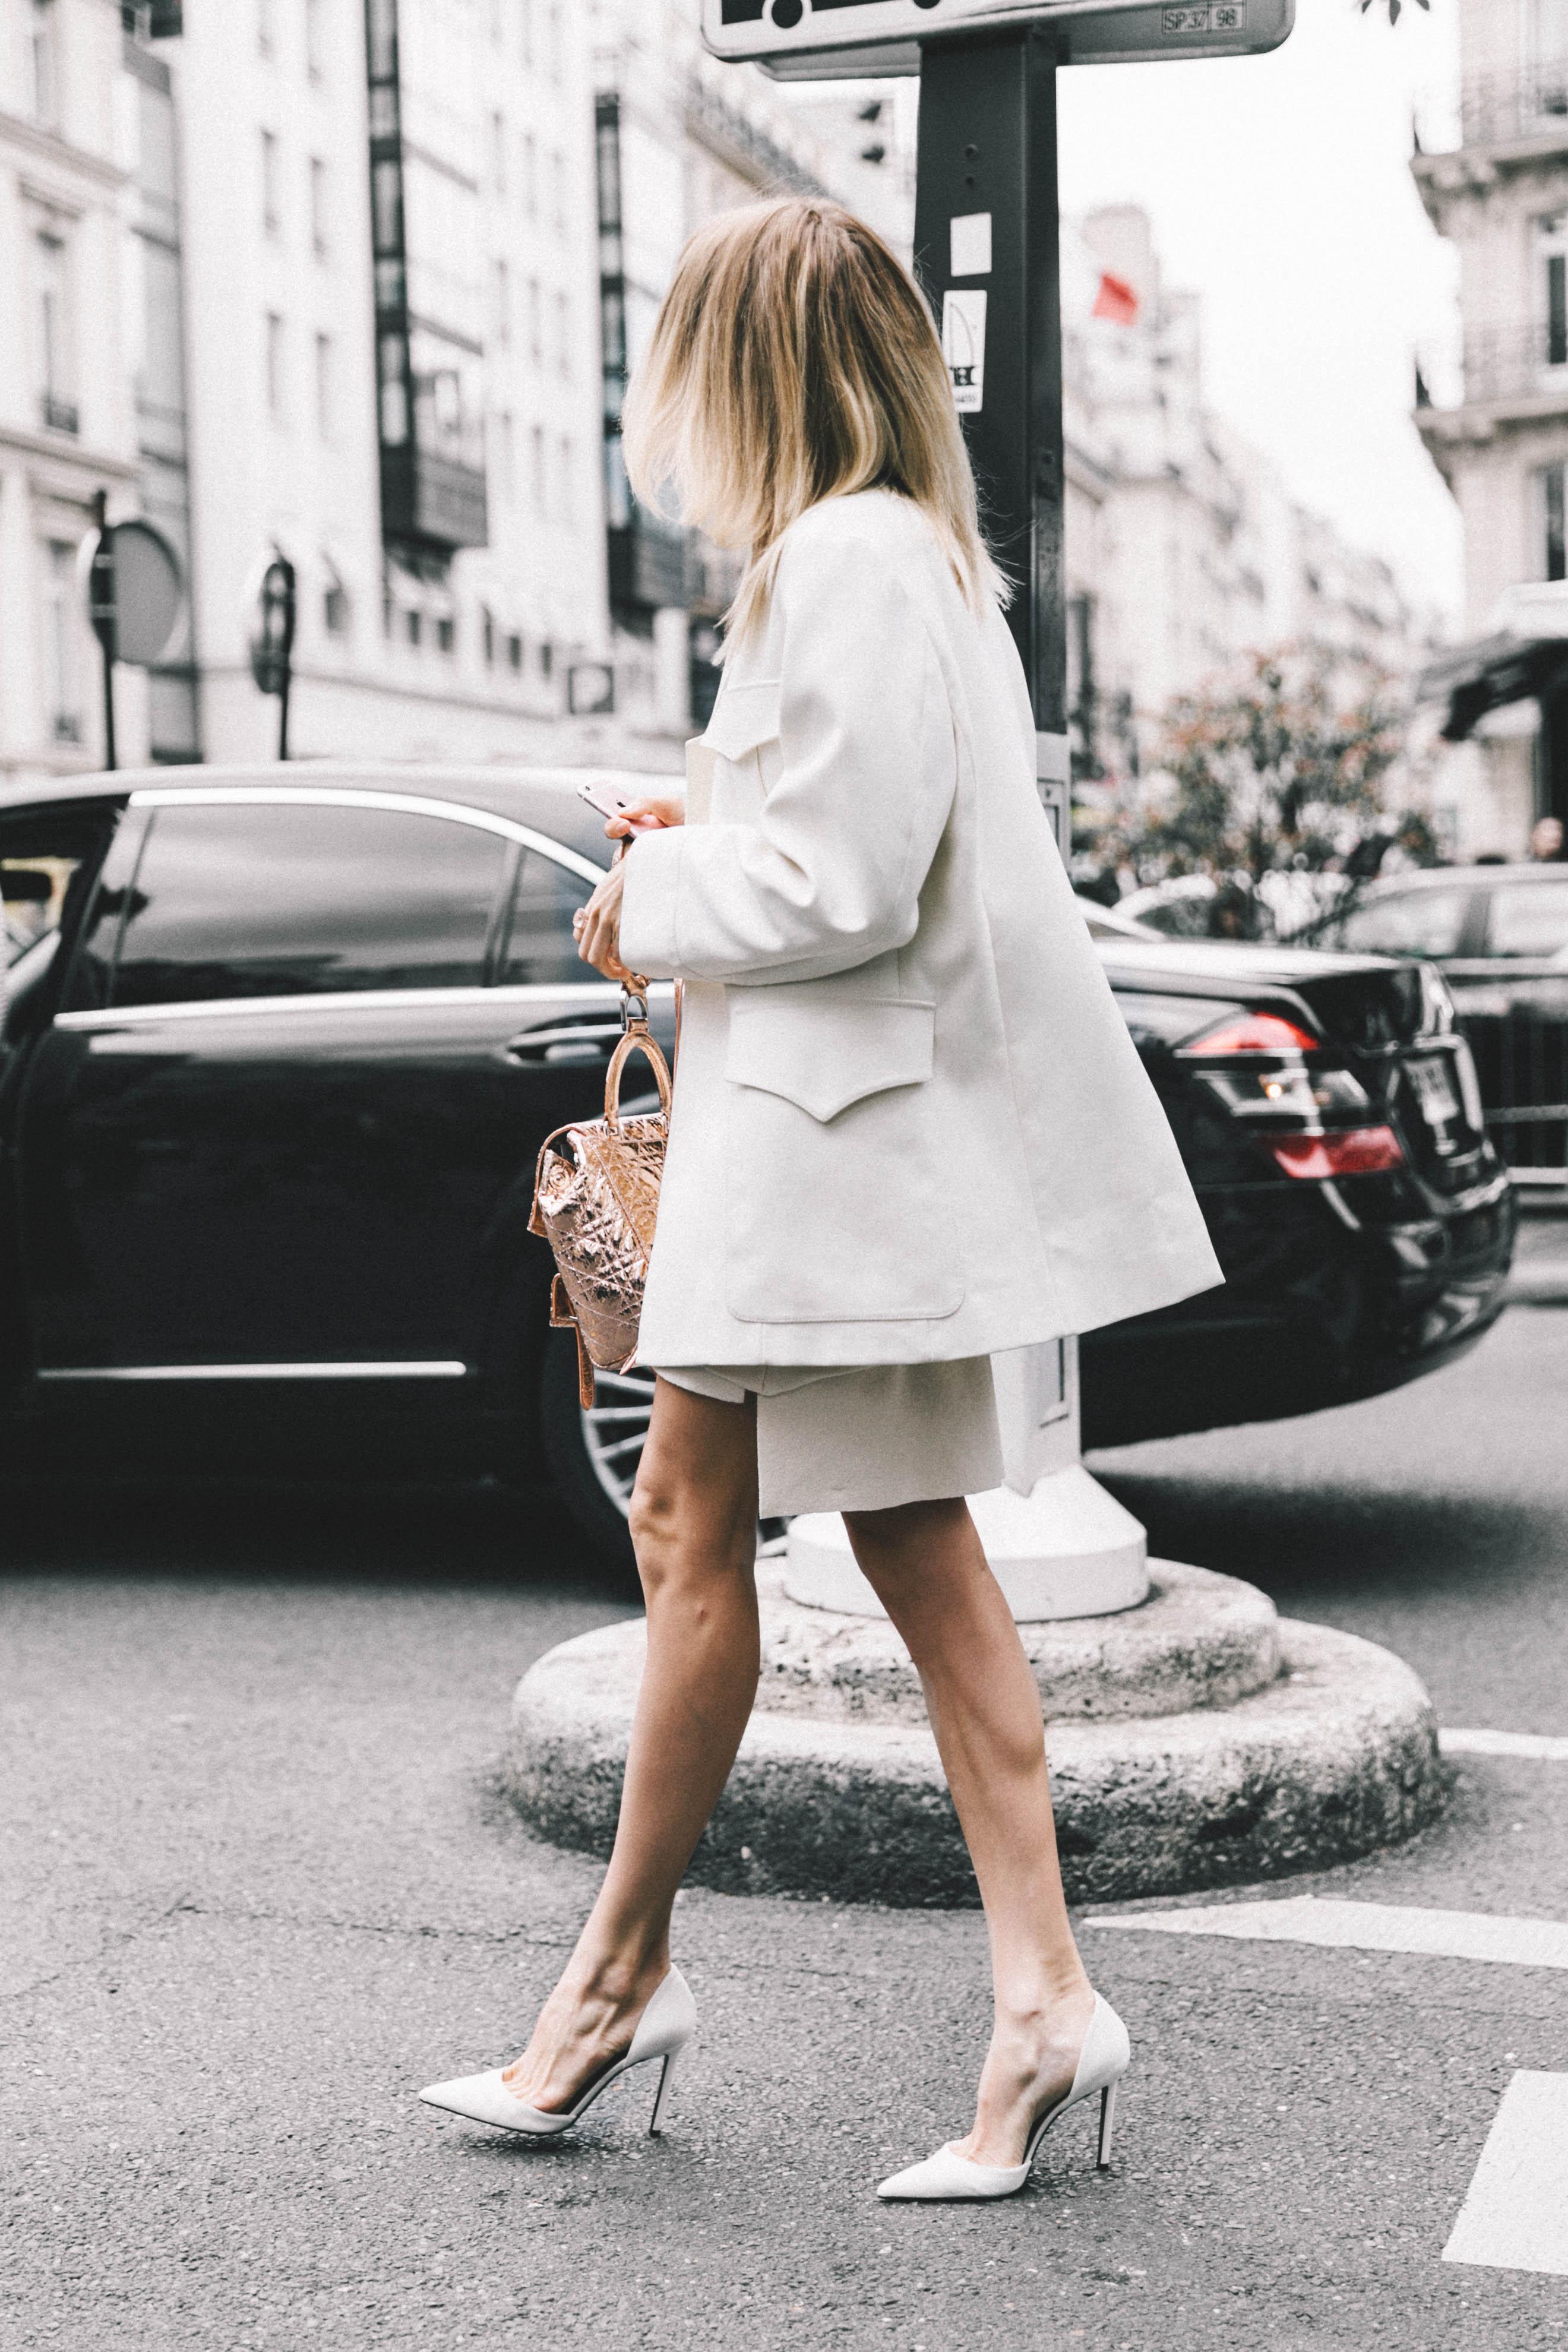 paris_couture_fashion_week-collage_vintage-88